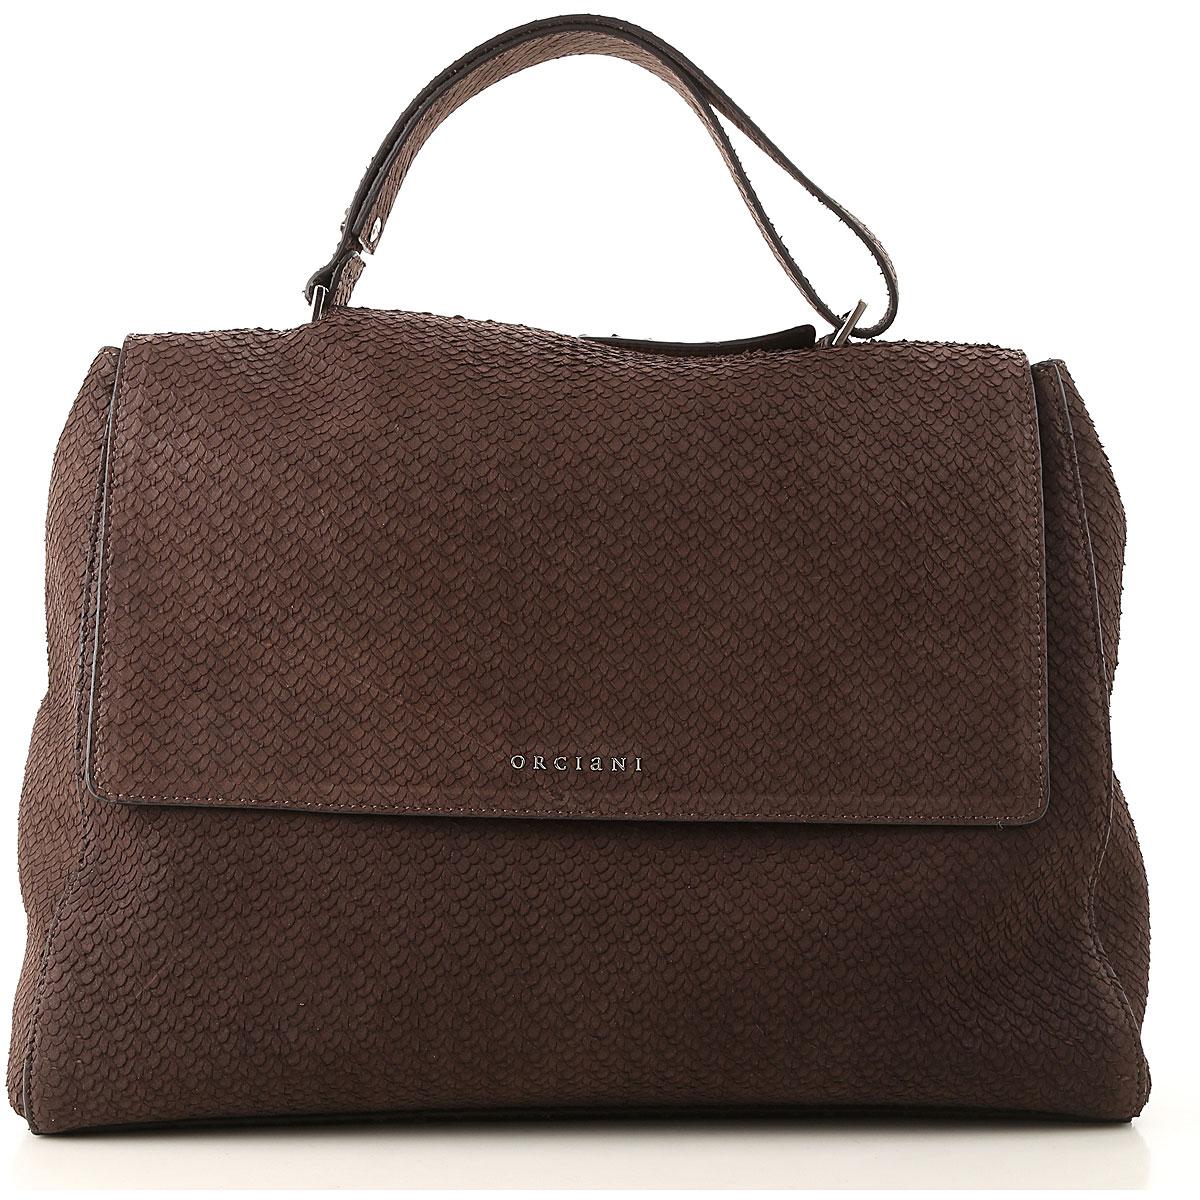 Image of Orciani Handbags, Brown, suede, 2017